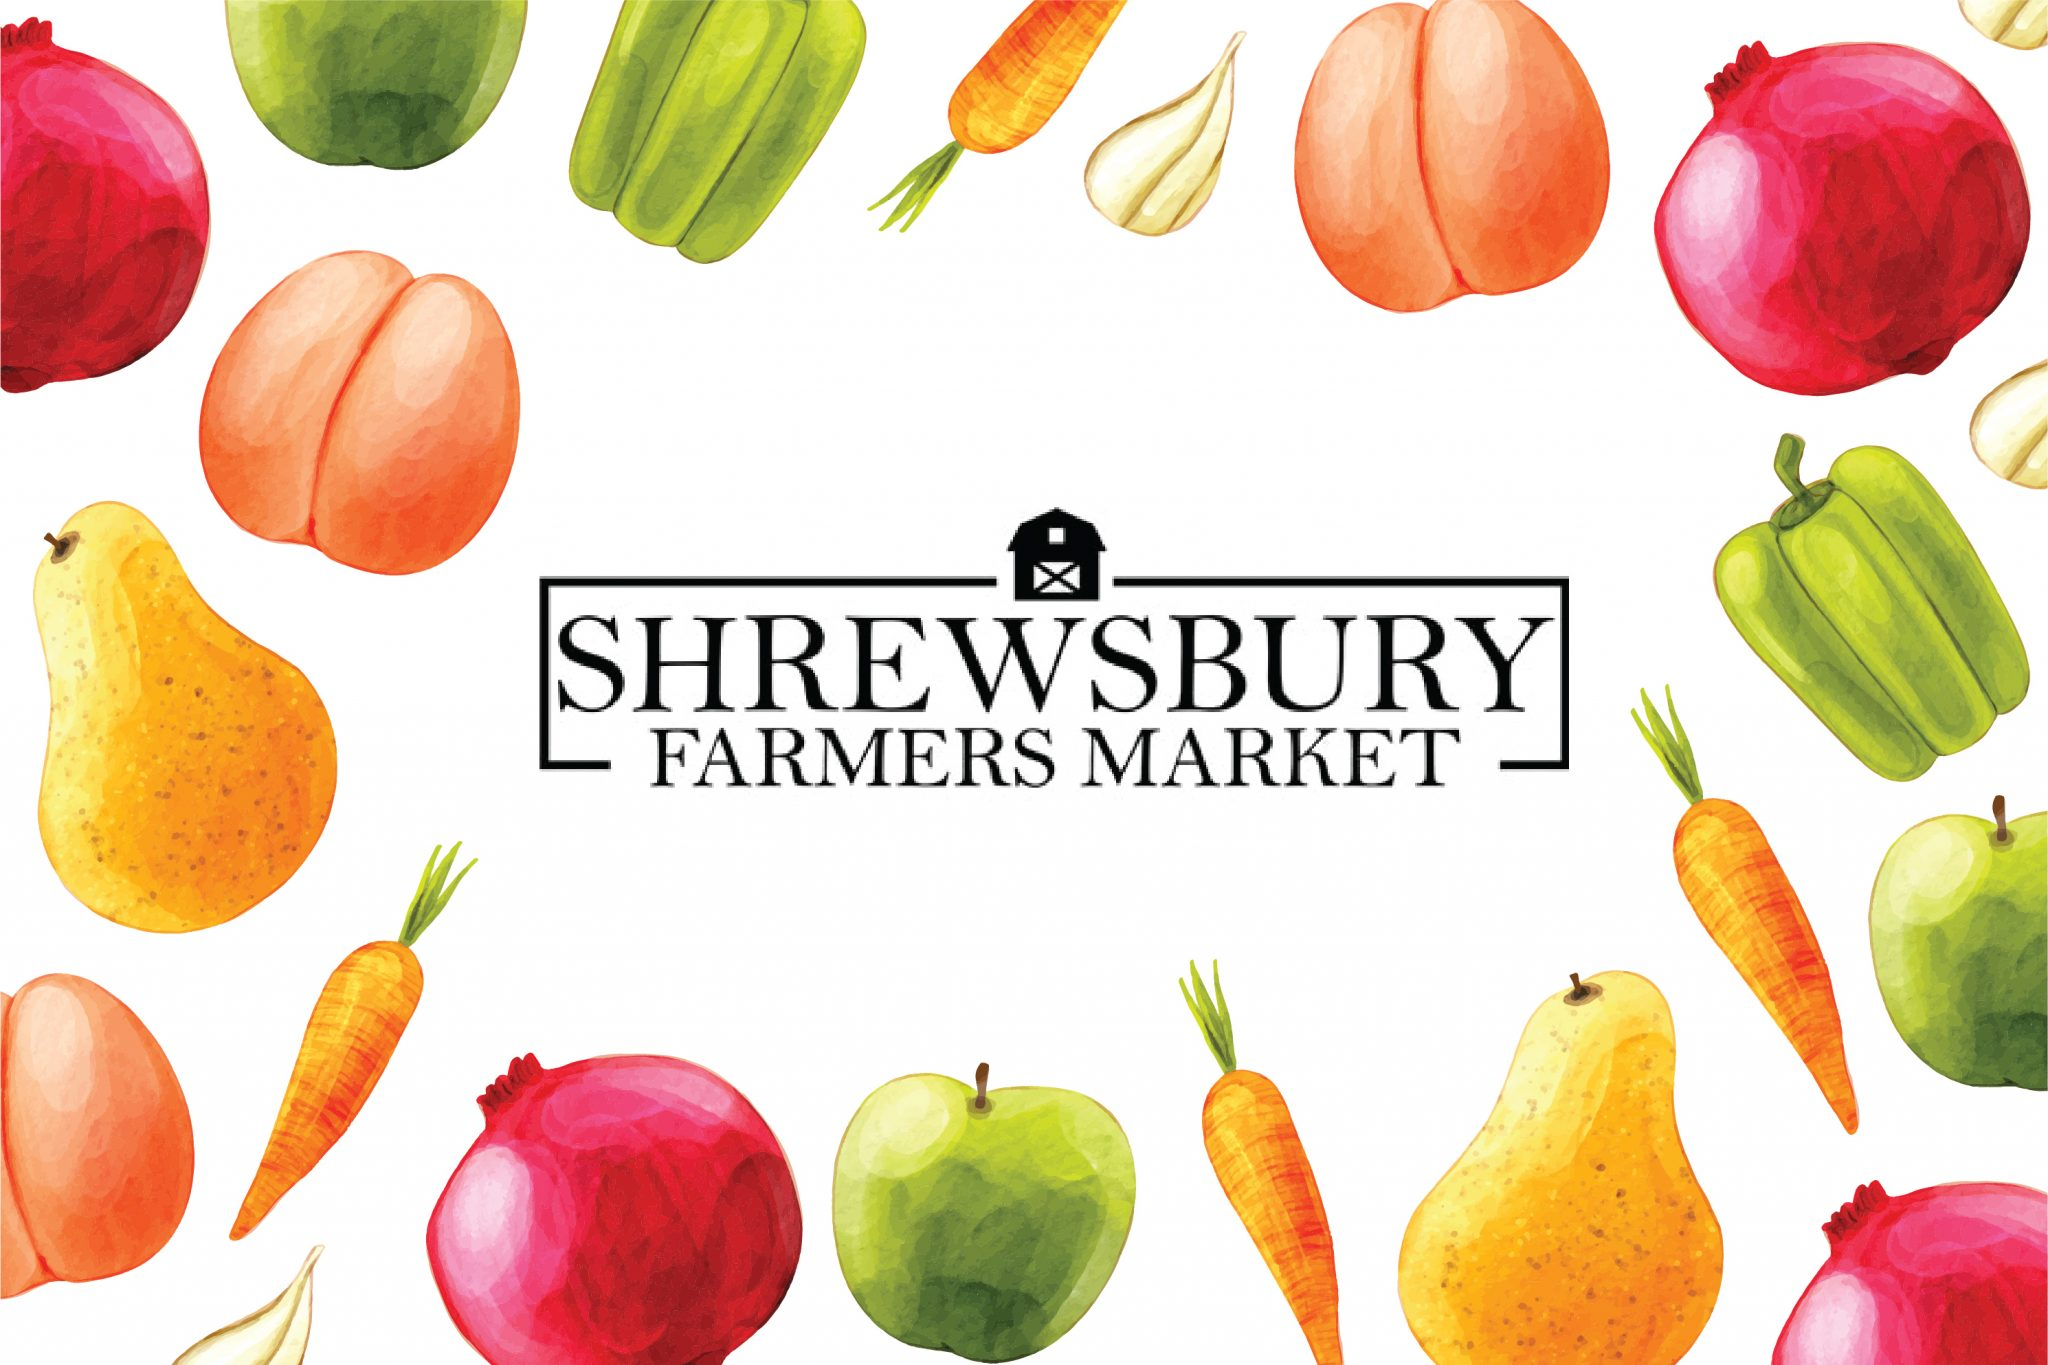 Shrewsbury Farmers Market logo